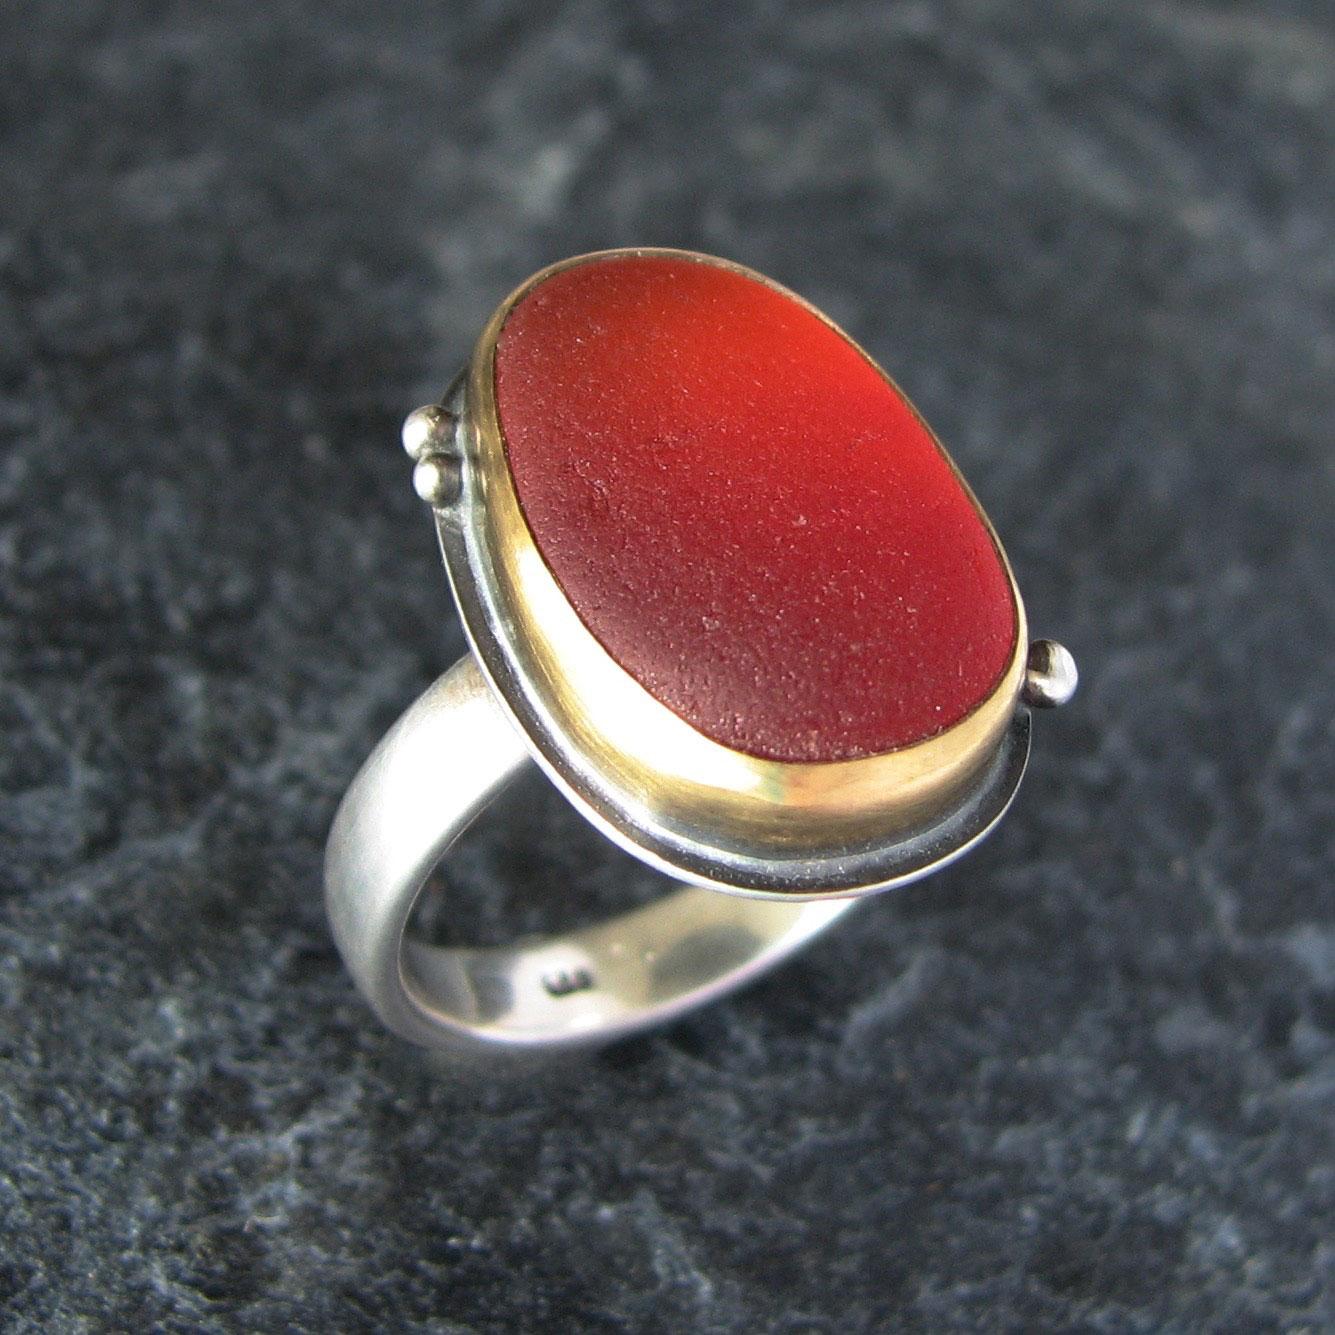 sea-glass-ring-red-monica-branstrom-studio.jpg